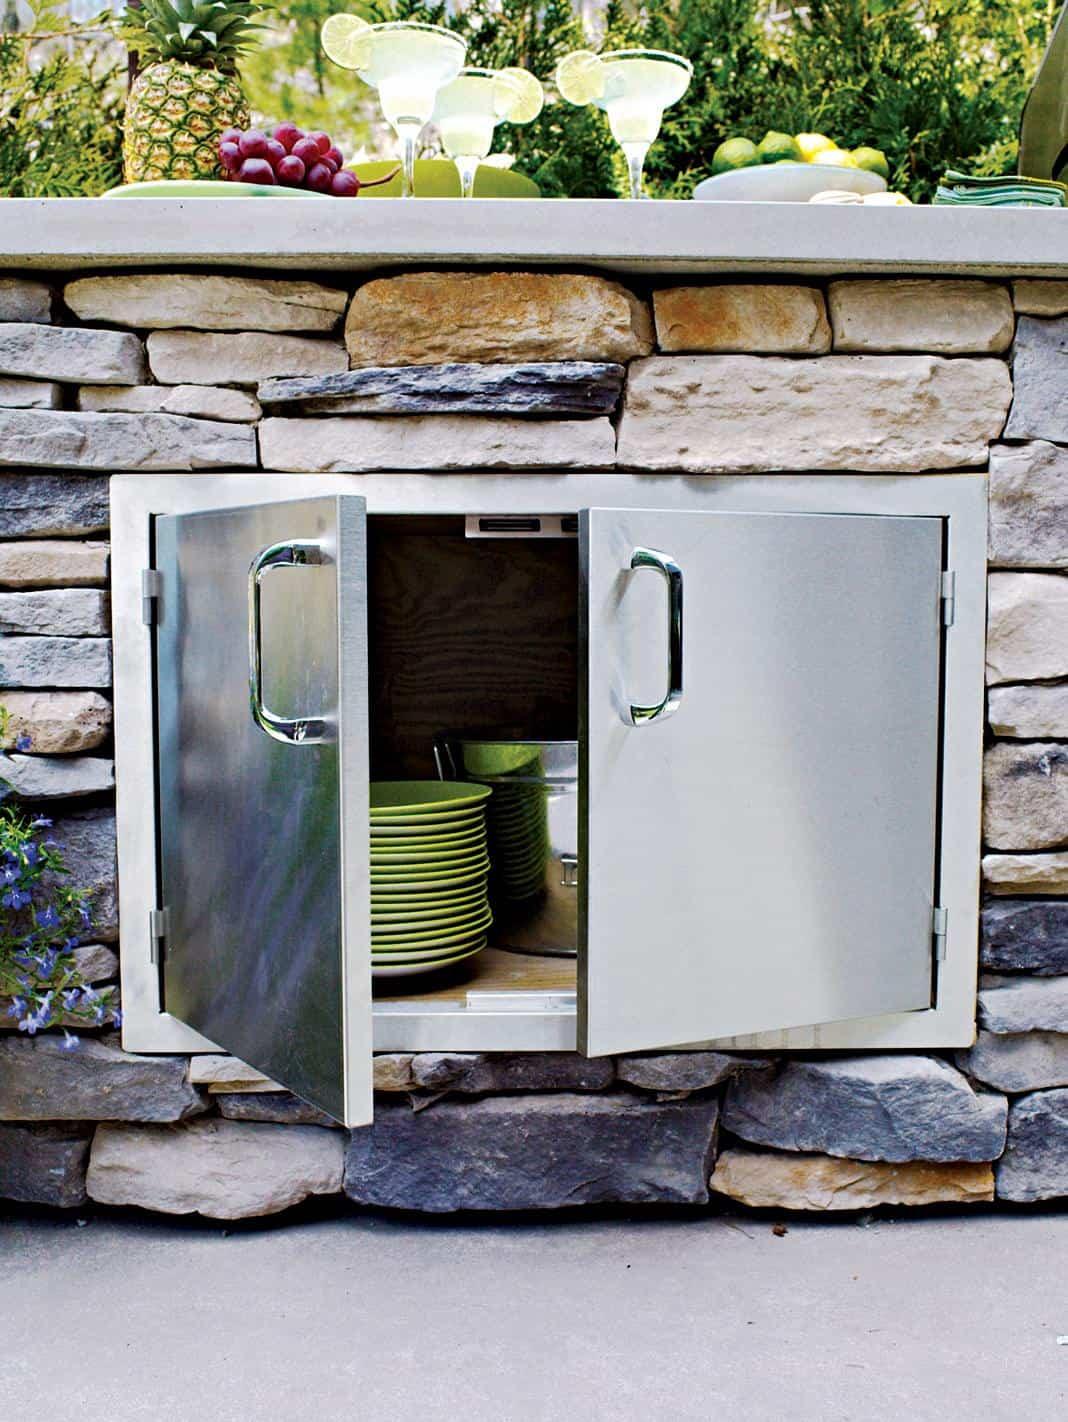 Diy Outdoor Kitchen Ideas  15 Outdoor Kitchen Designs That You Can Help DIY